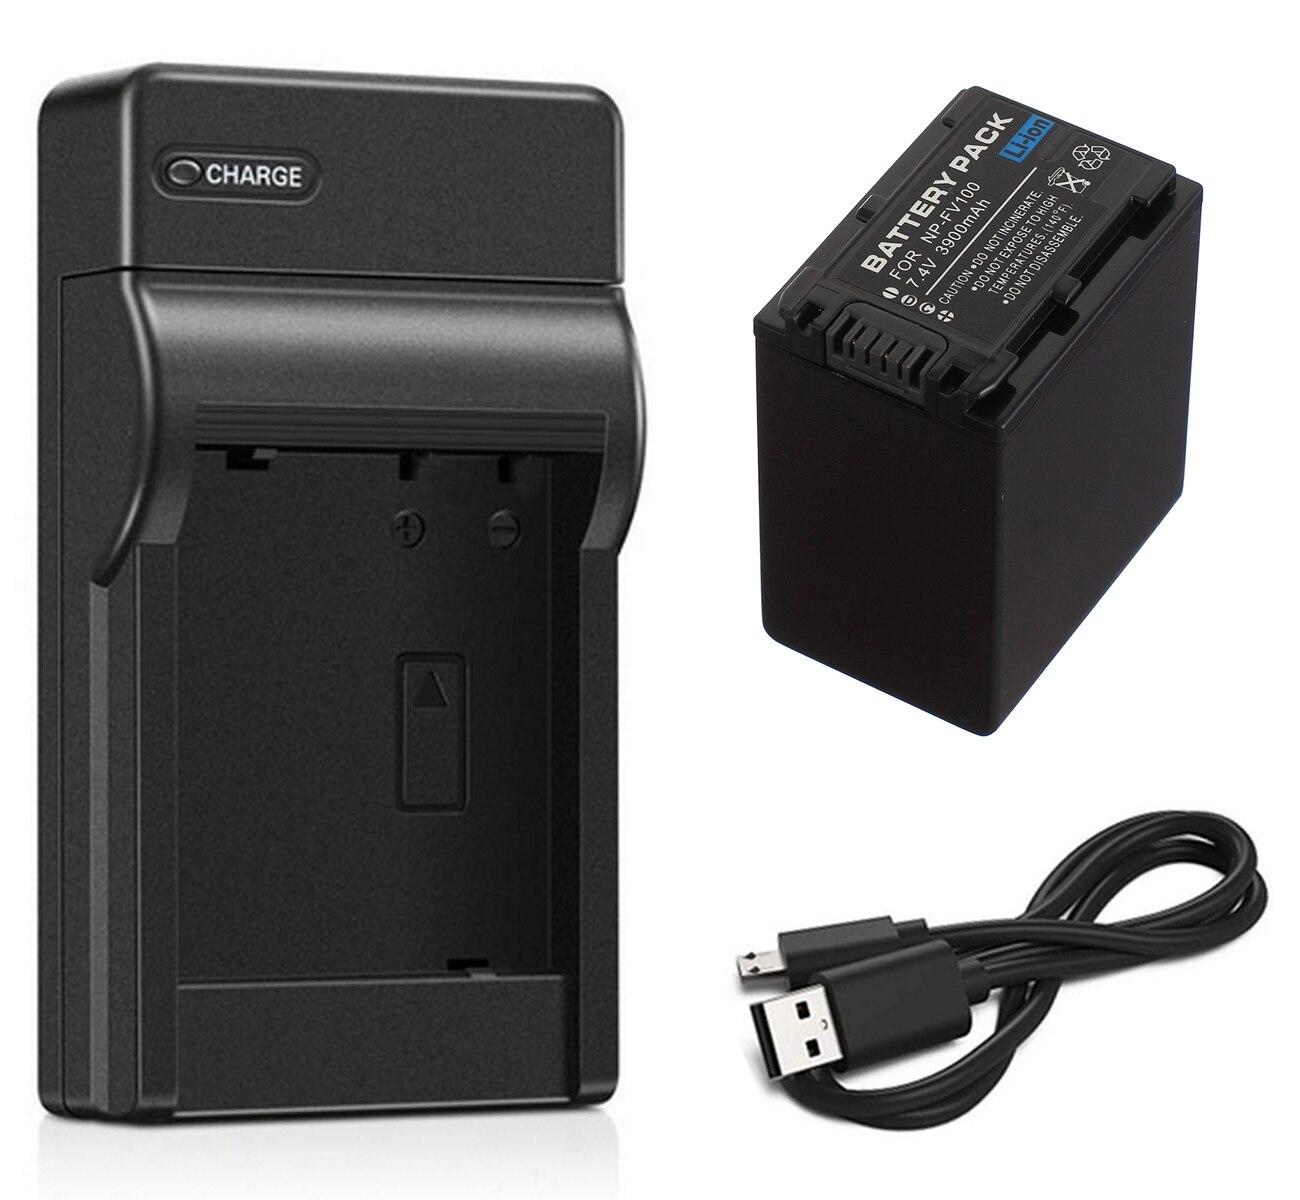 Paquete de baterías + cargador para Sony Handycam HDR-PJ610, HDR-PJ710V, HDR-PJ720, HDR-PJ740V,...